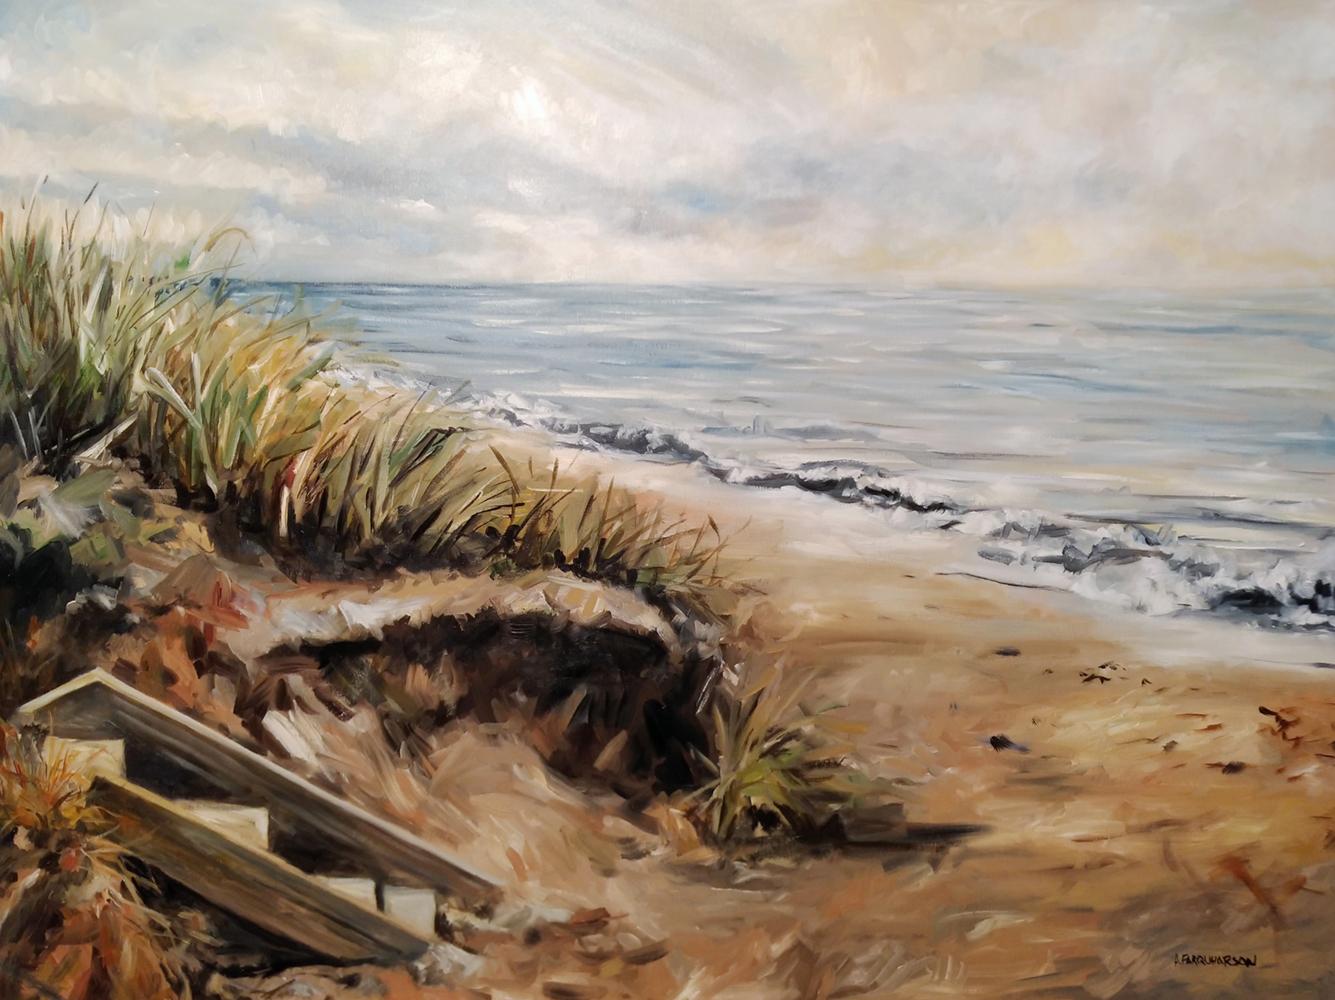 Lake Huron Sunrise by Amanda Farquharson 30 x 40 inches, oil on canvas